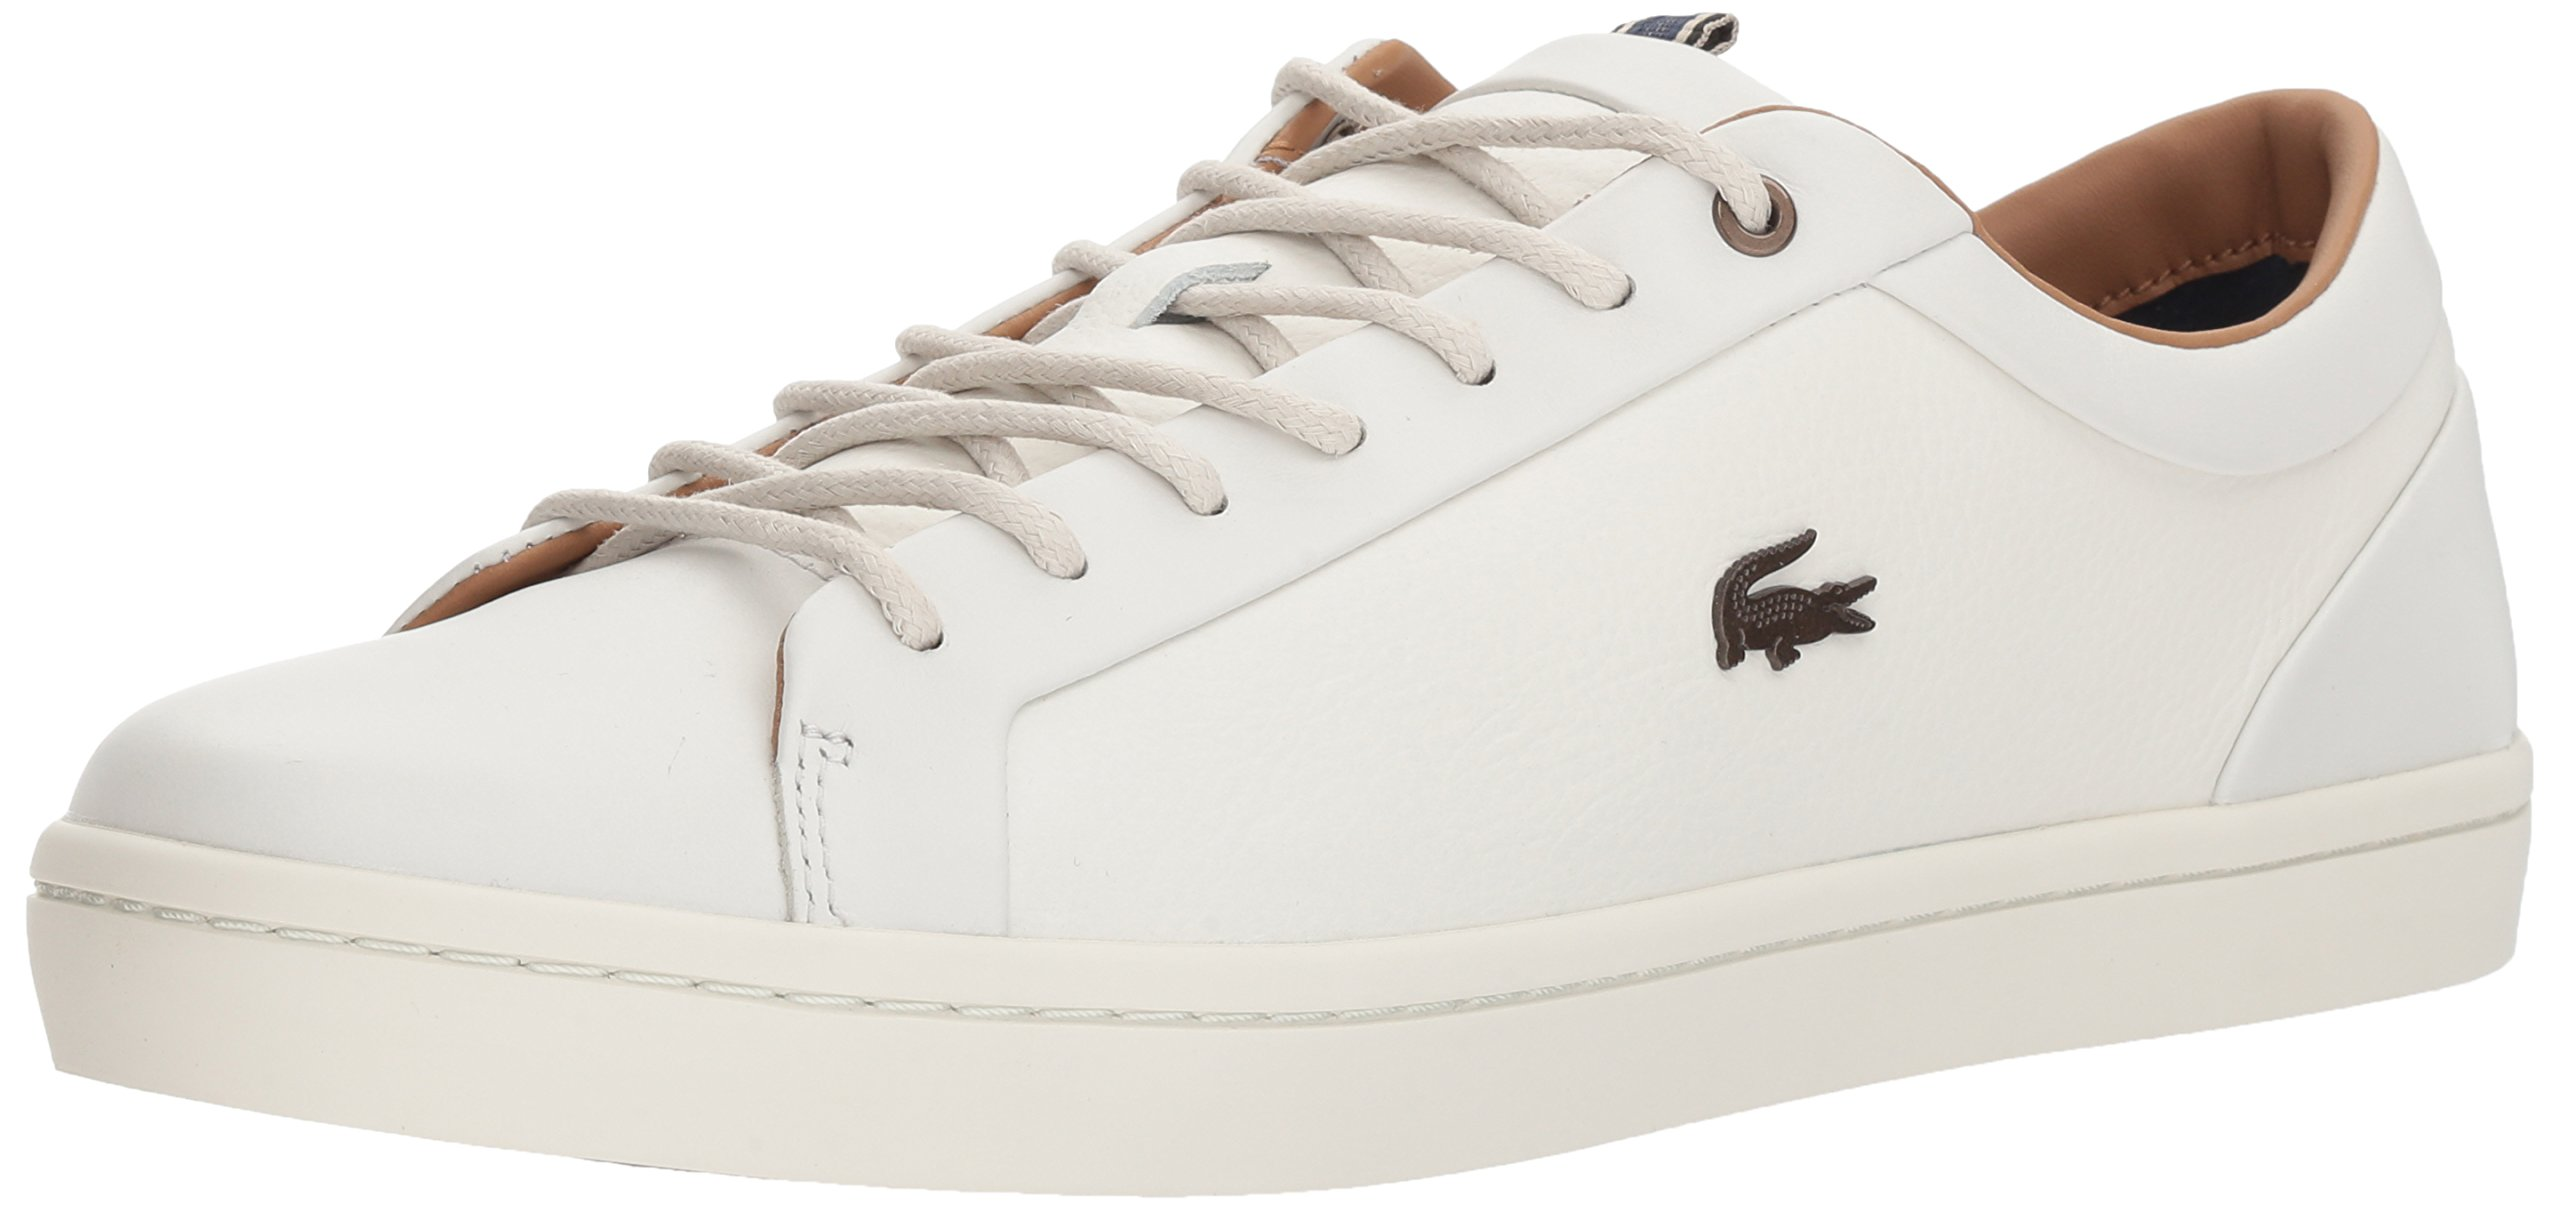 Lacoste Men's Straightset Sneakers